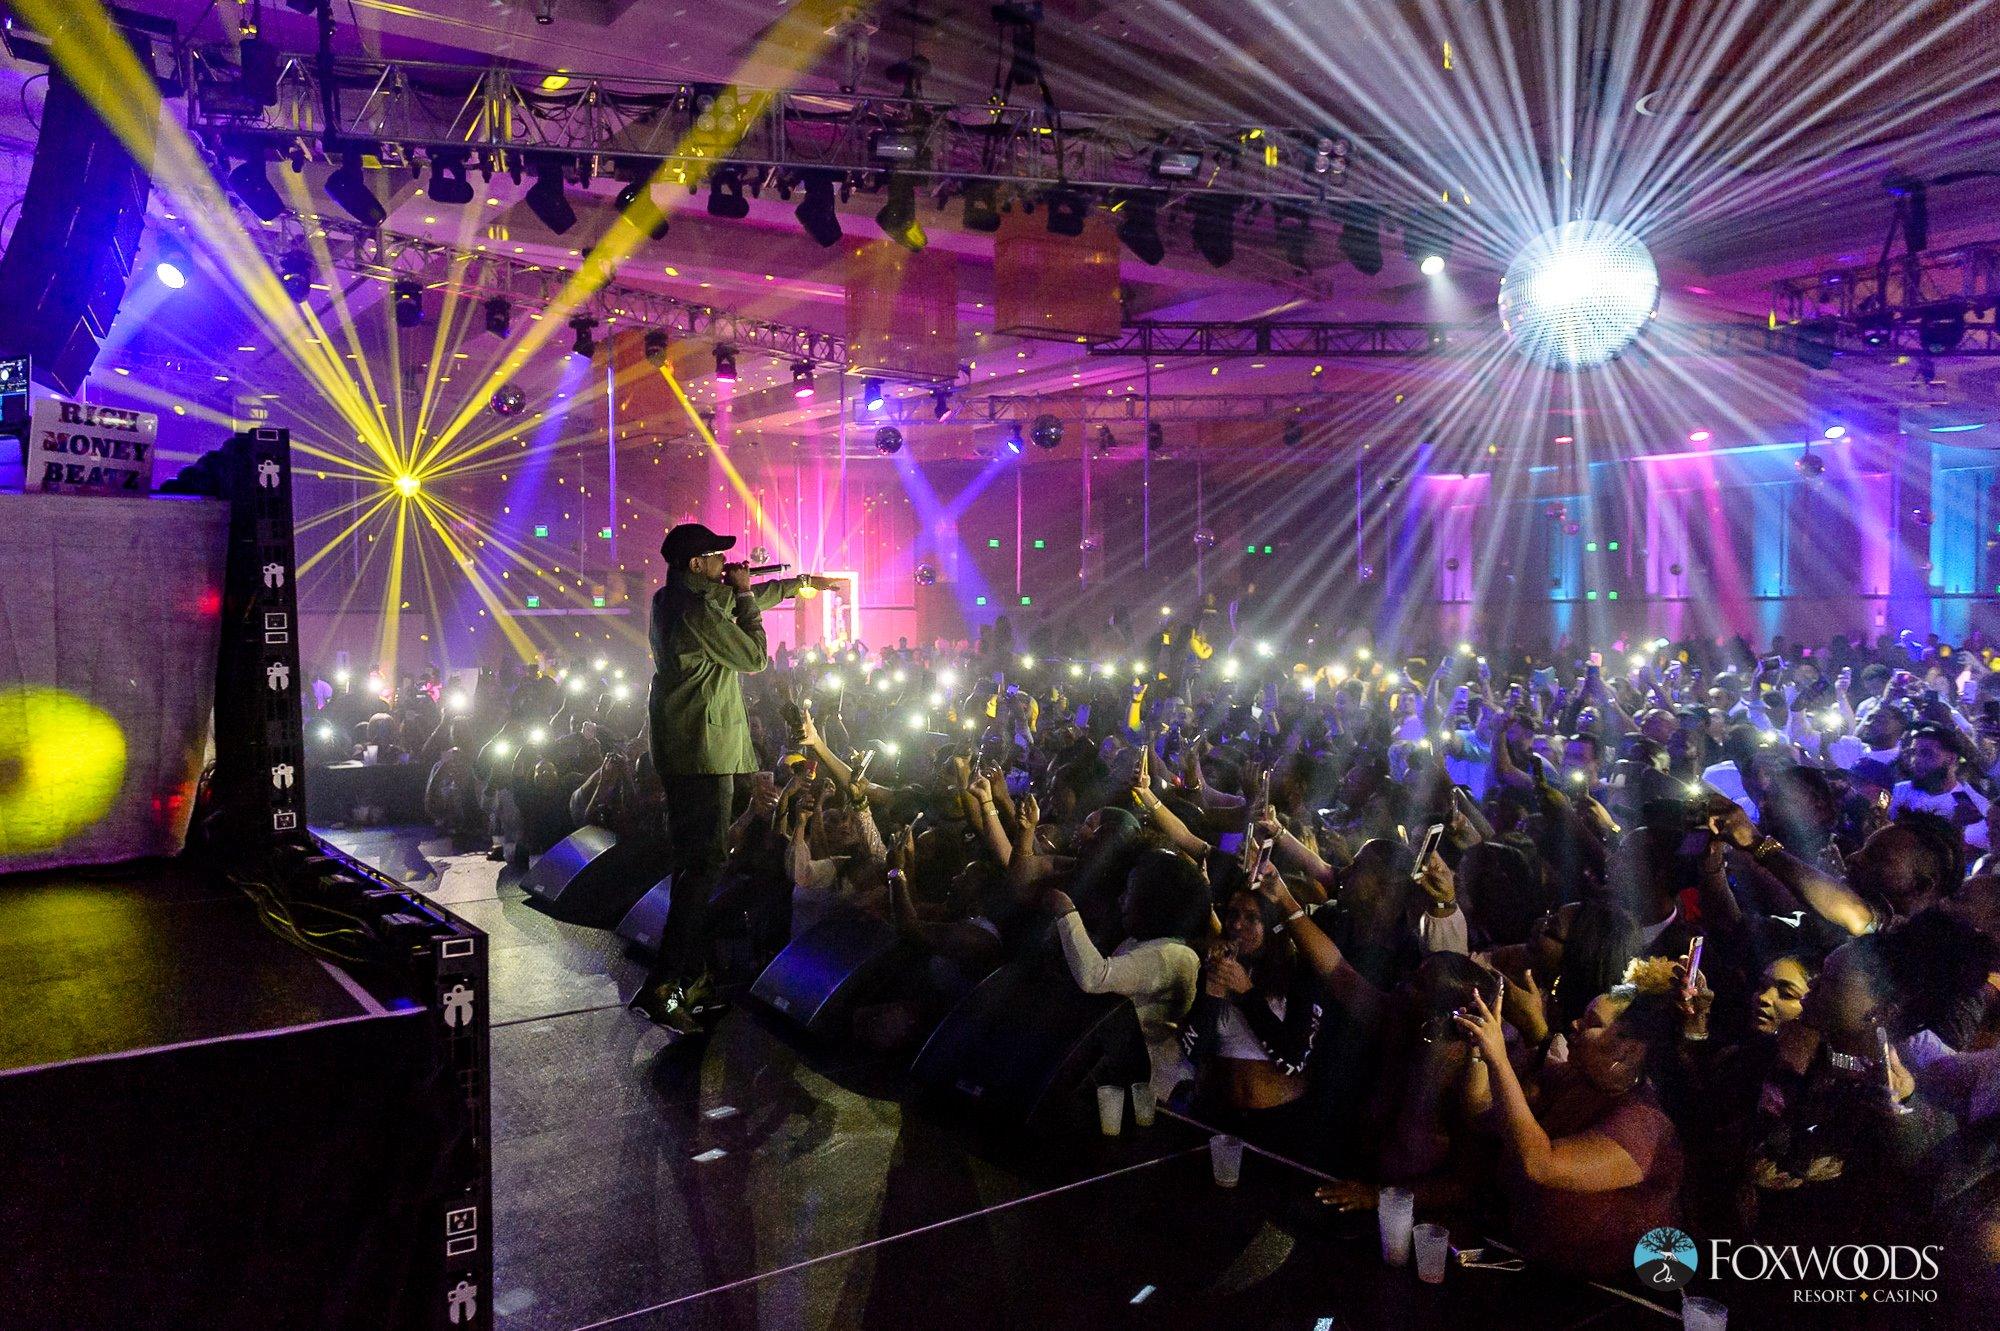 Foxwoods rap concert work and travel IECenter